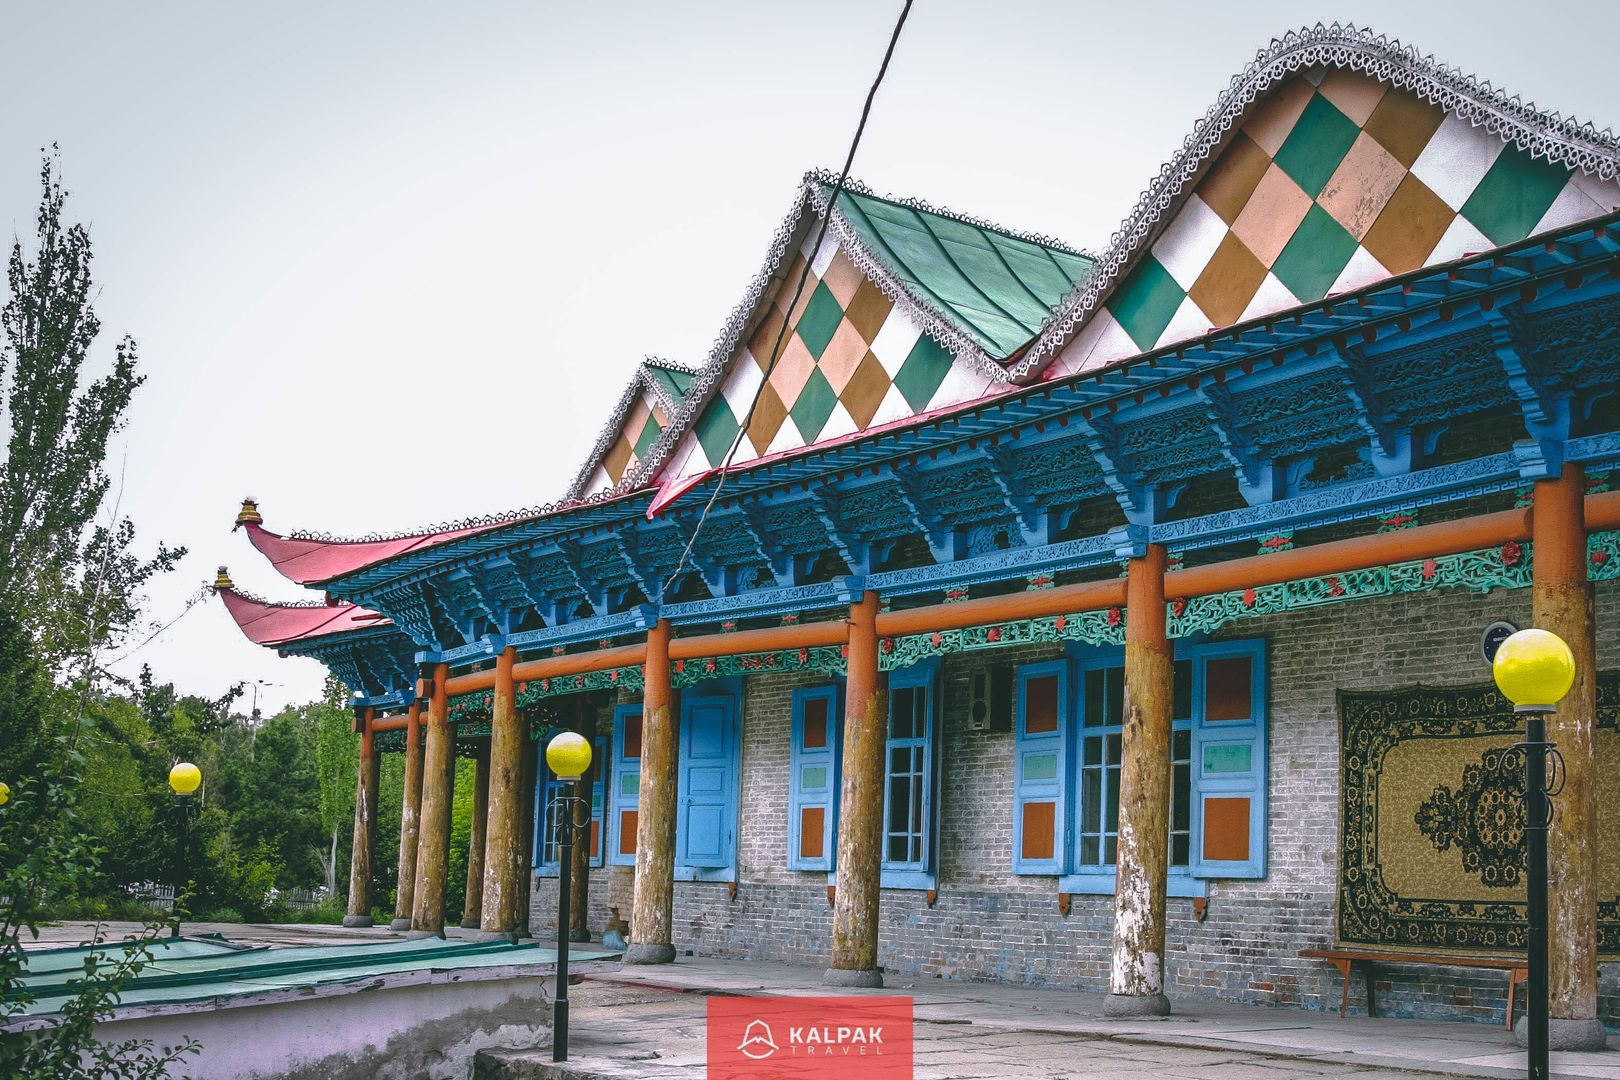 سفر قرقیزستان، کاراکول